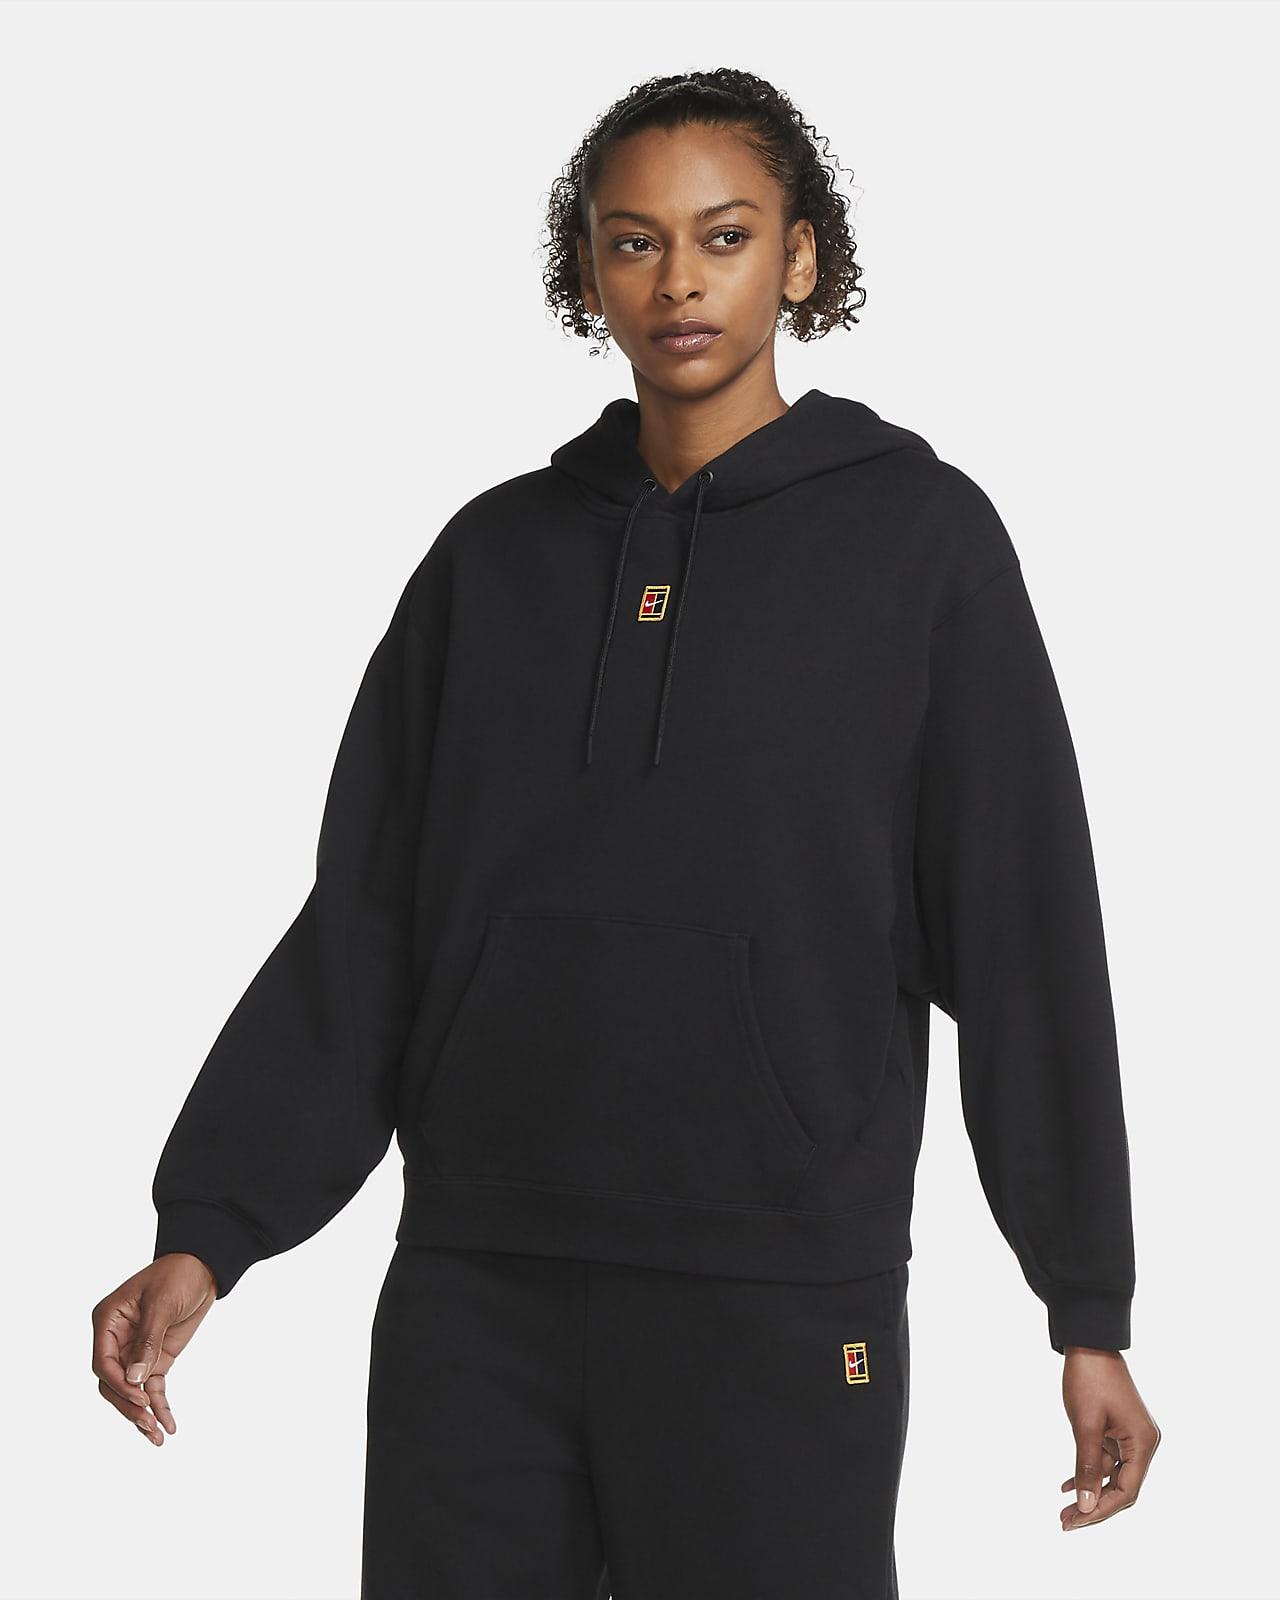 télex Pino Mariscos  Sudadera con capucha de tenis de tejido Fleece para mujer NikeCourt. Nike .com